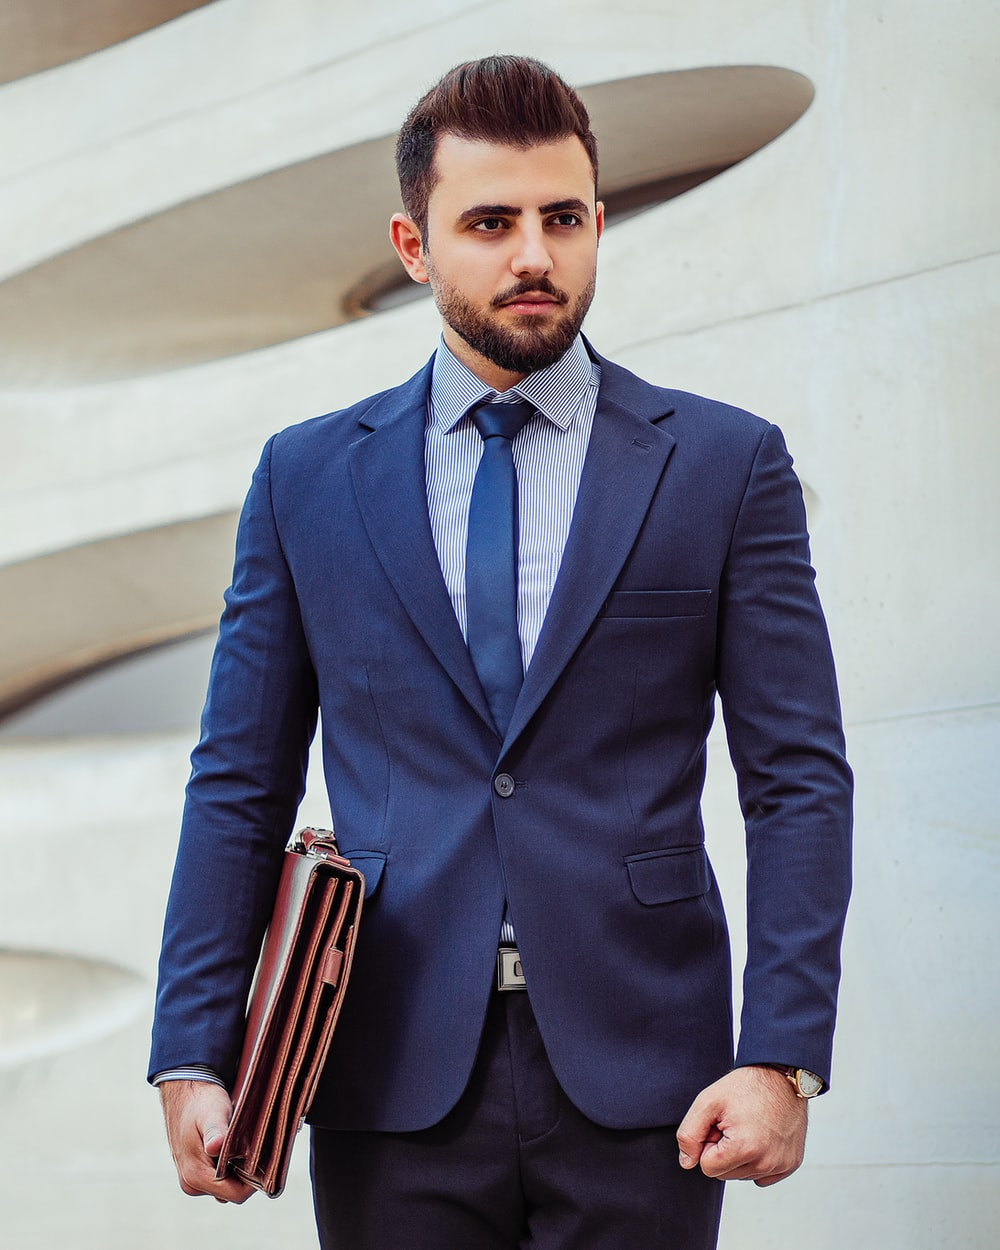 man in black suit jacket holding brown leather bag